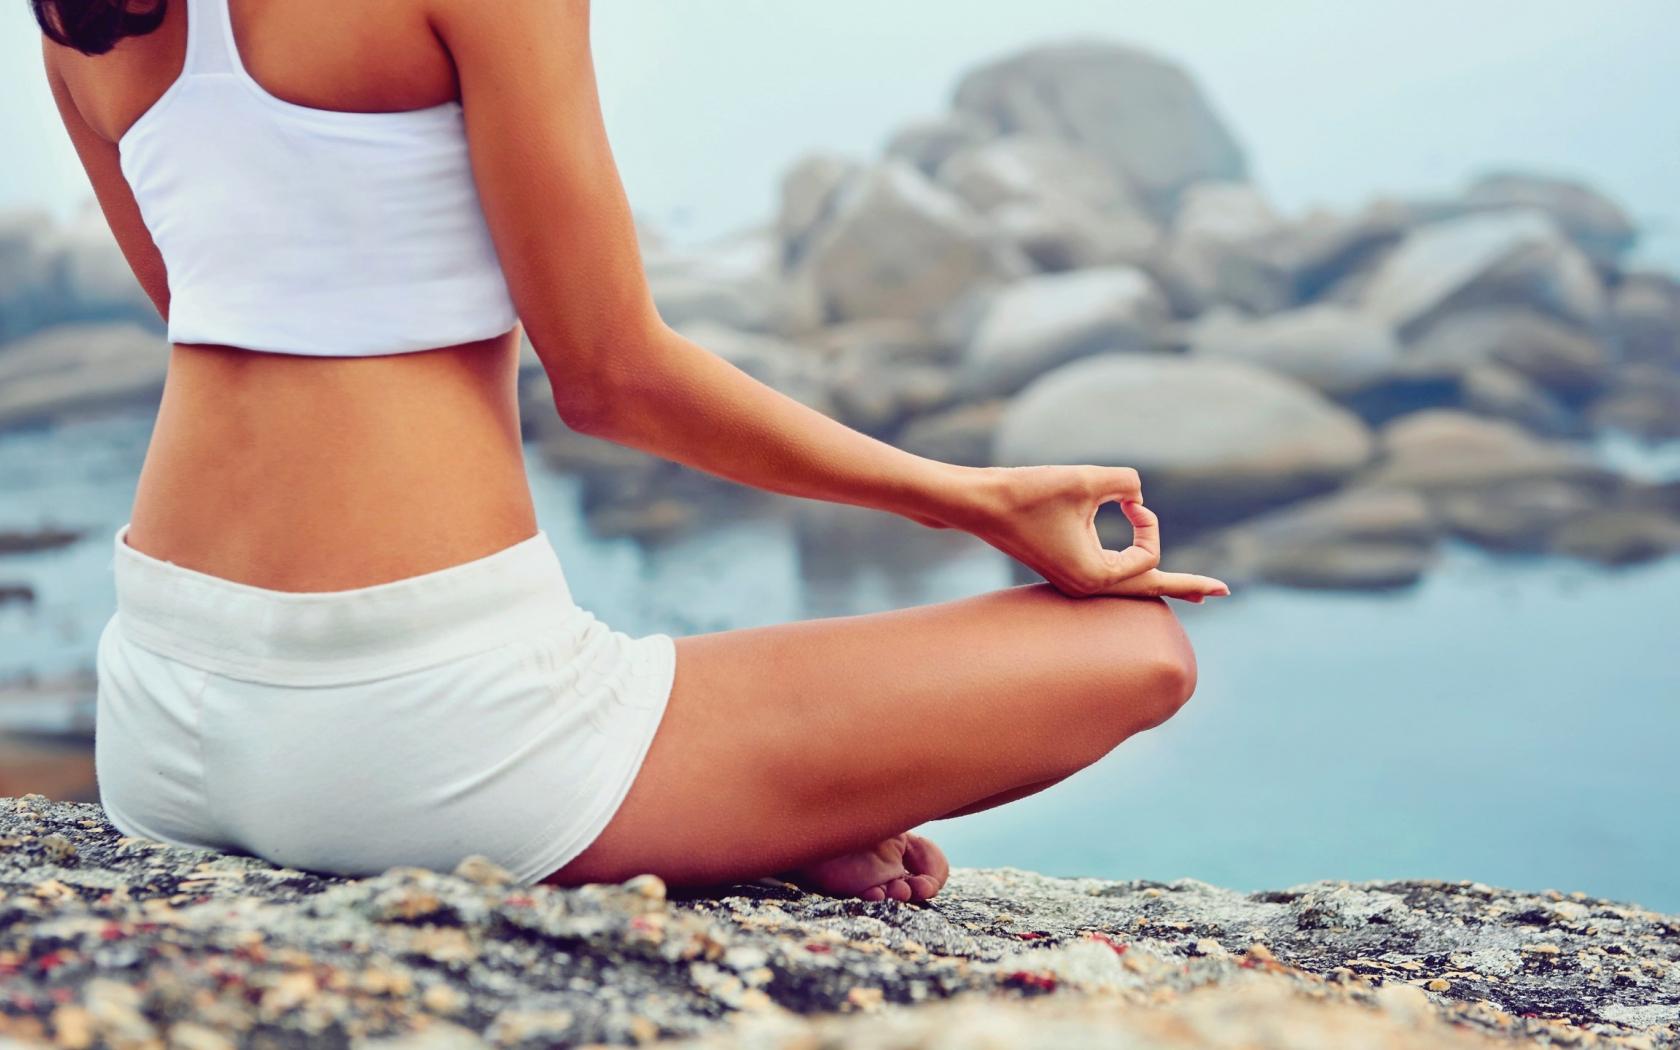 Desktop Wallpaper Yoga Meditation Fitness Rocks Hd Image Picture Background Snjuoe